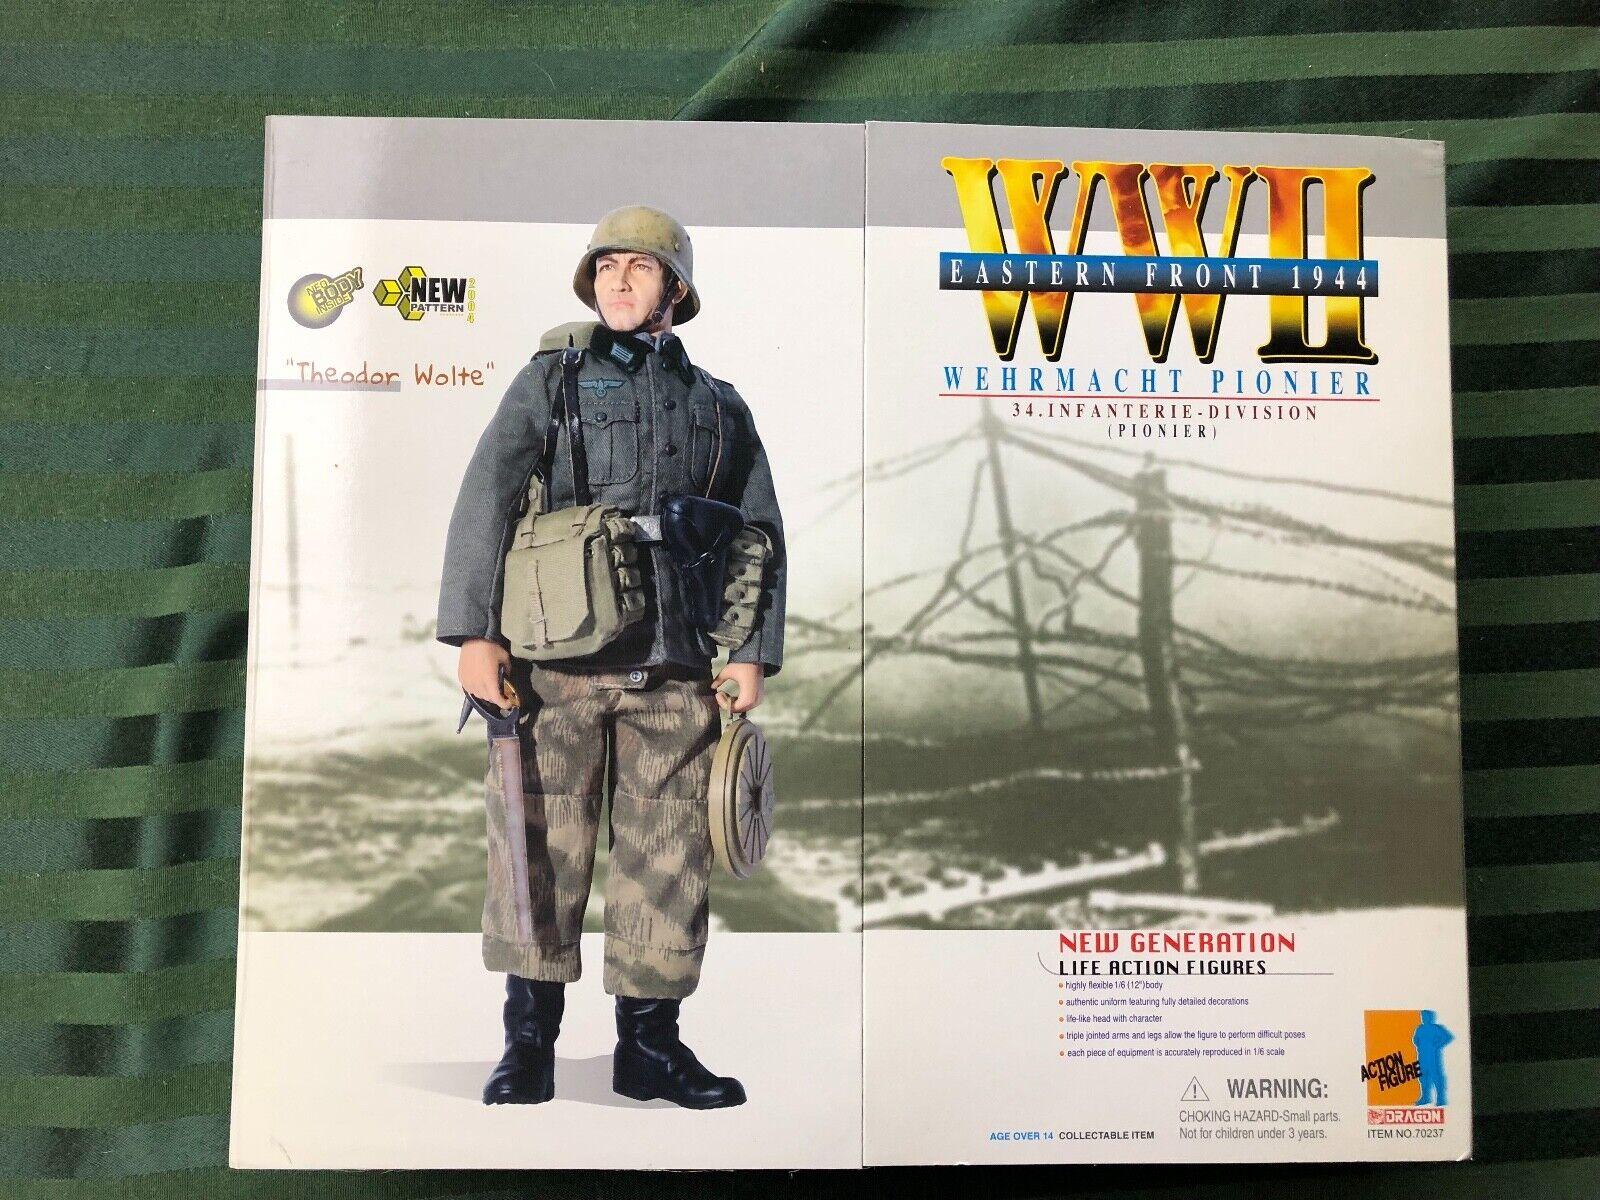 Dragon WWII Wehrmacht Pionier  Theodor Wolte  Eastern Front 1944